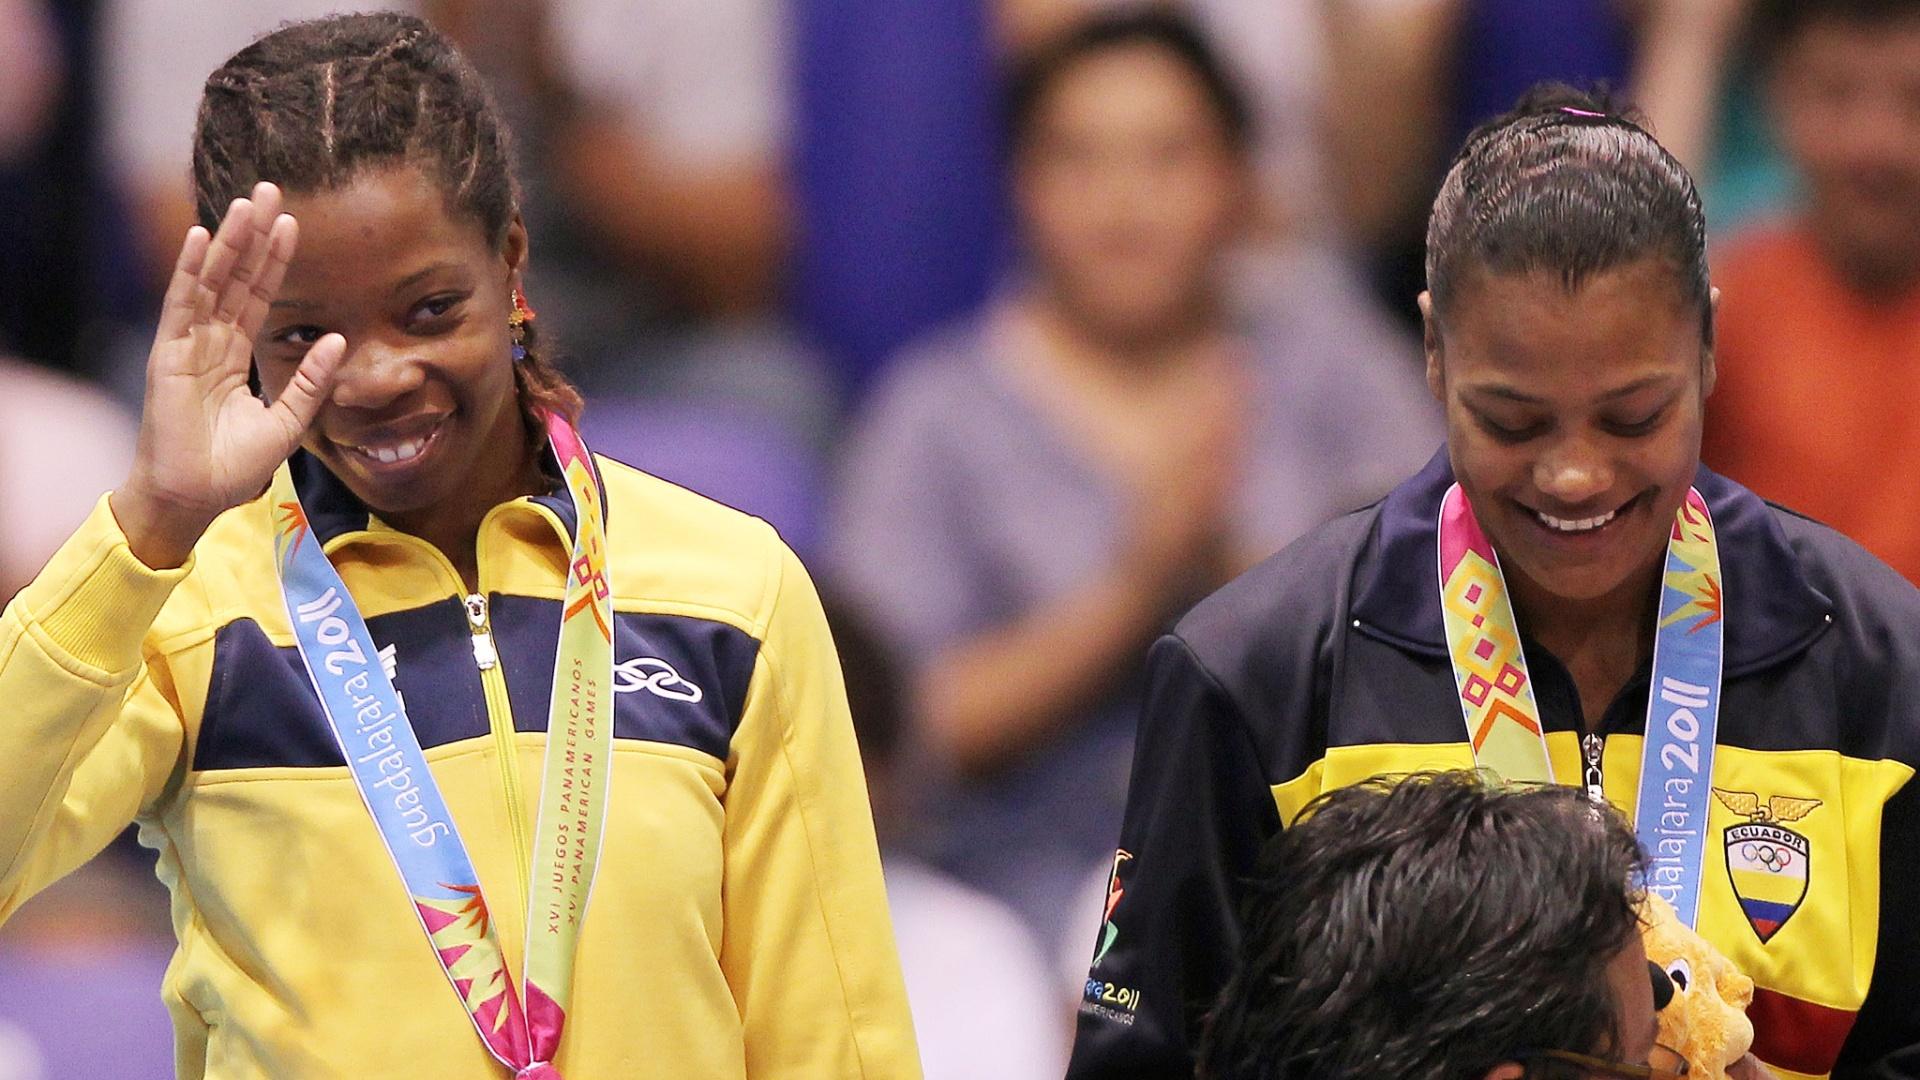 Joice Silva recebe a medalha de bronze conquistada na luta olímpica (22/10/2011)